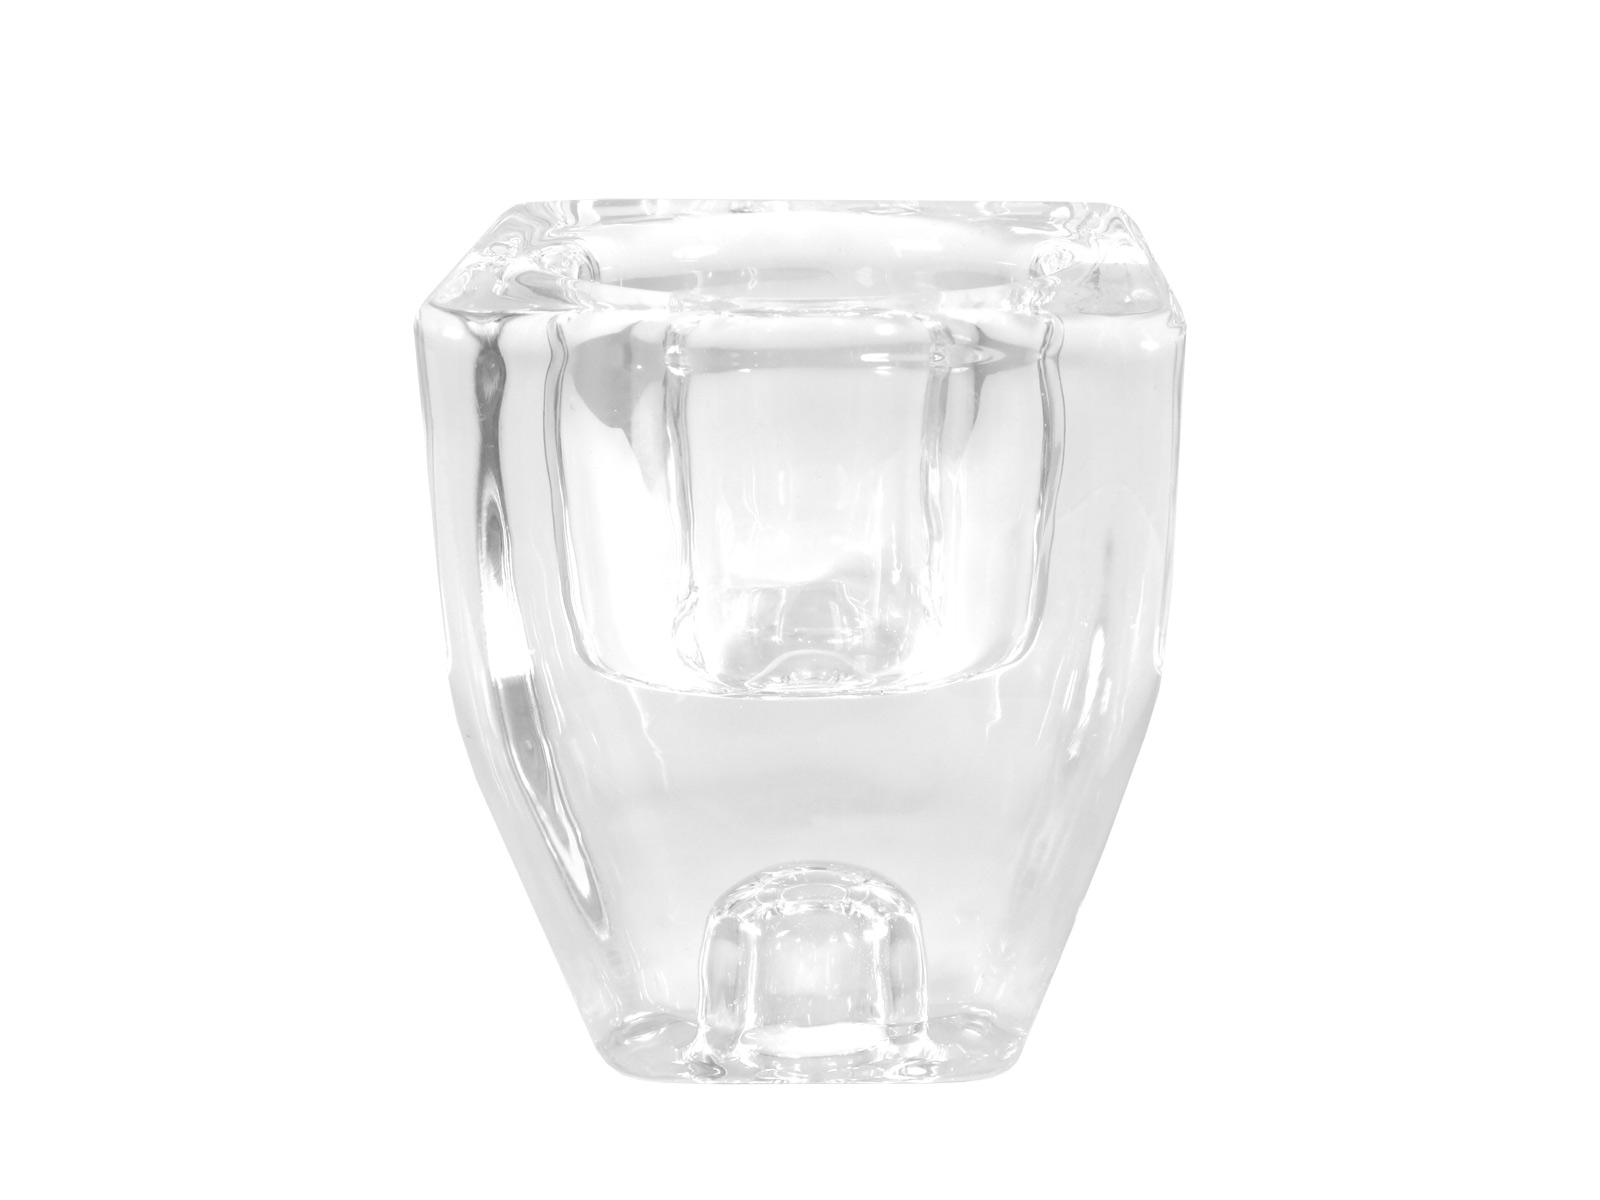 Подсвечник CrystalСвечи и подсвечники<br>Подсвечник для греющей свечи<br>